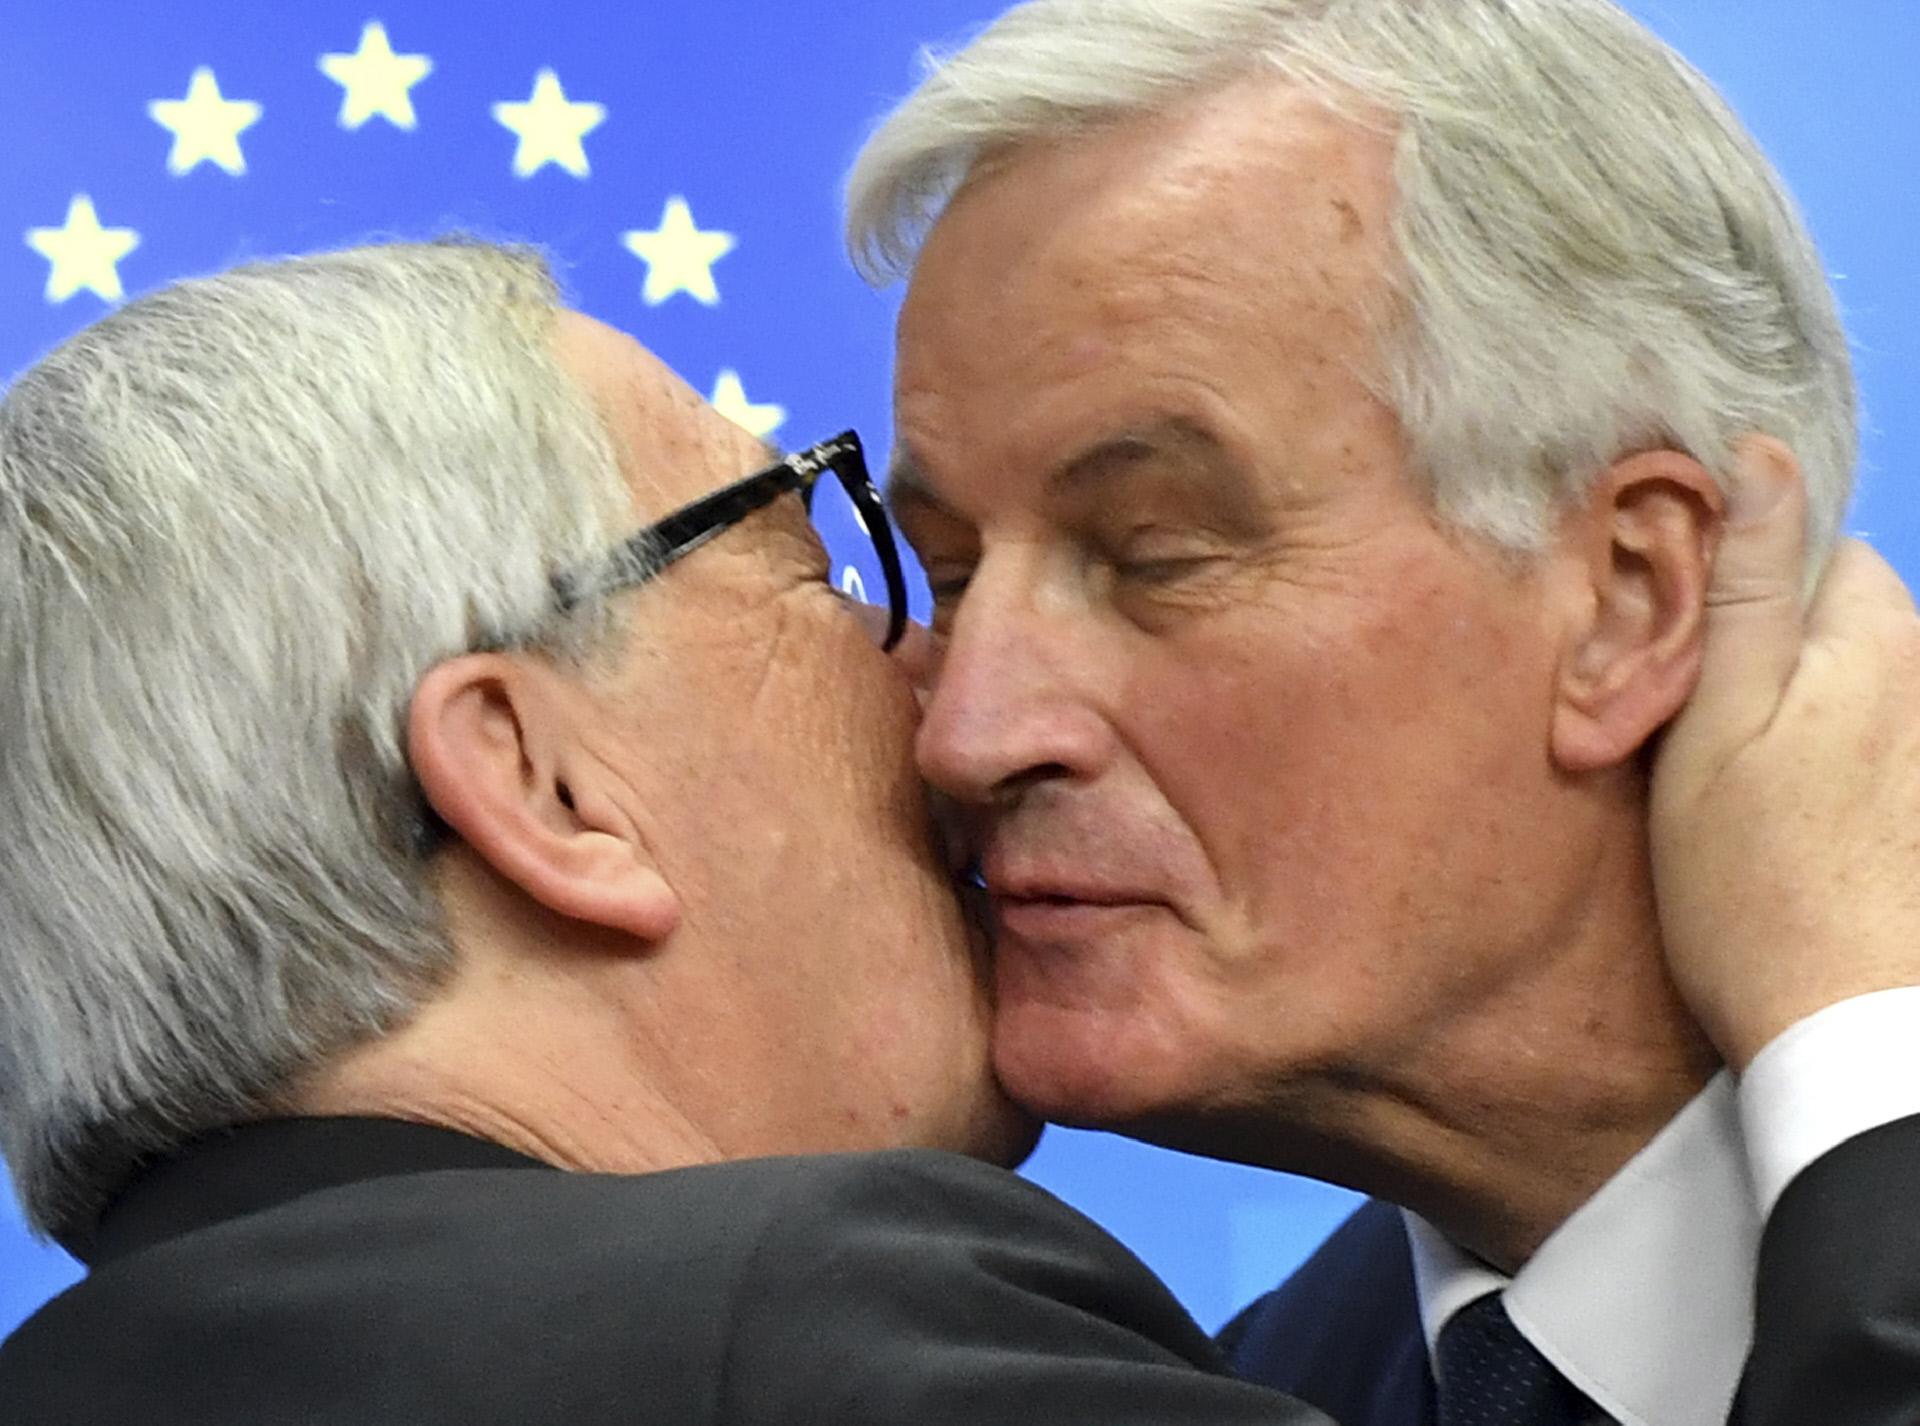 Presidente da CE, Jean Claude Juncker, beijando Michel Barnier, negociador do Brexit da UE, após acordo na cimeira da UE / Gtres